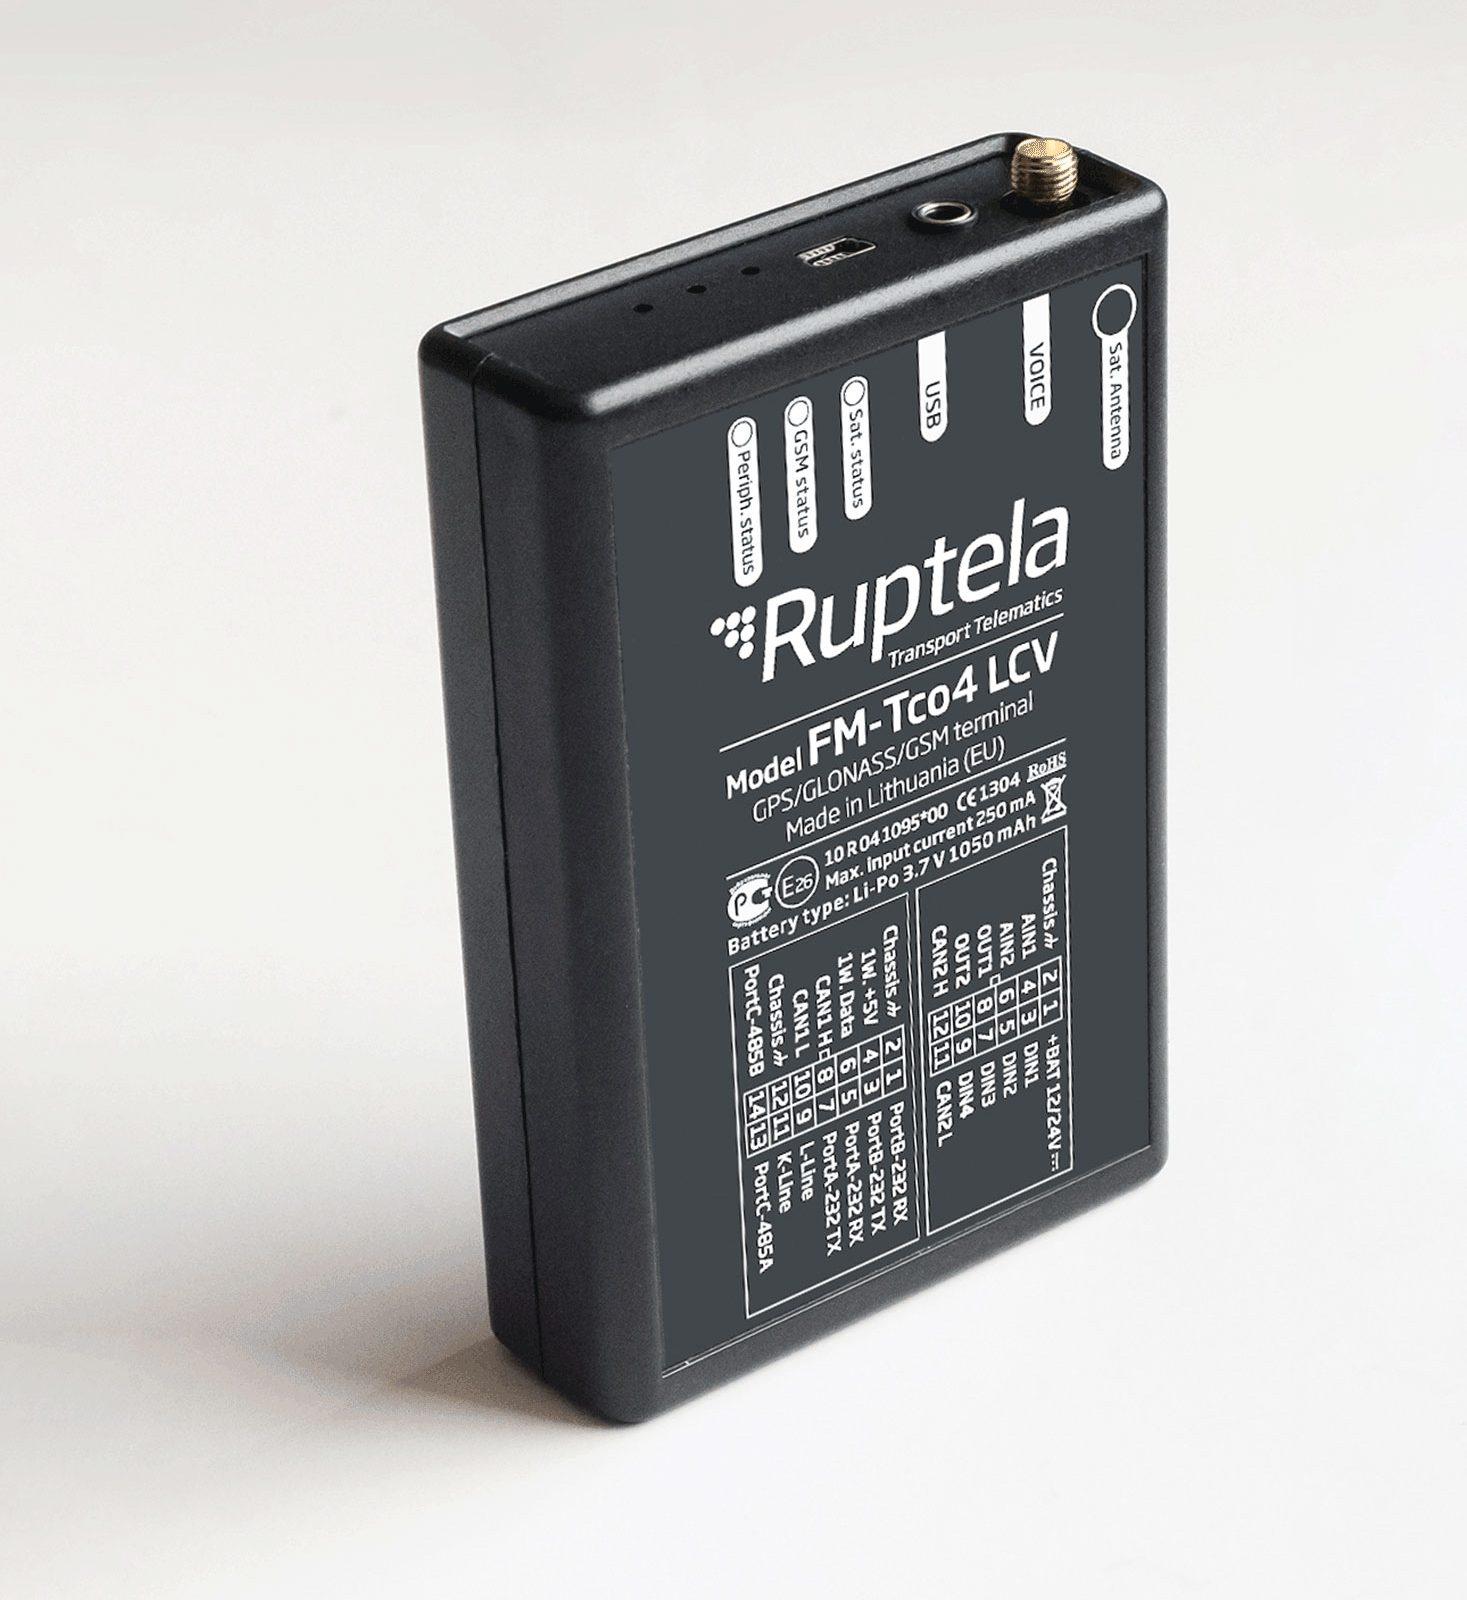 Ruptela-Tco4LCV-GPS-tracker